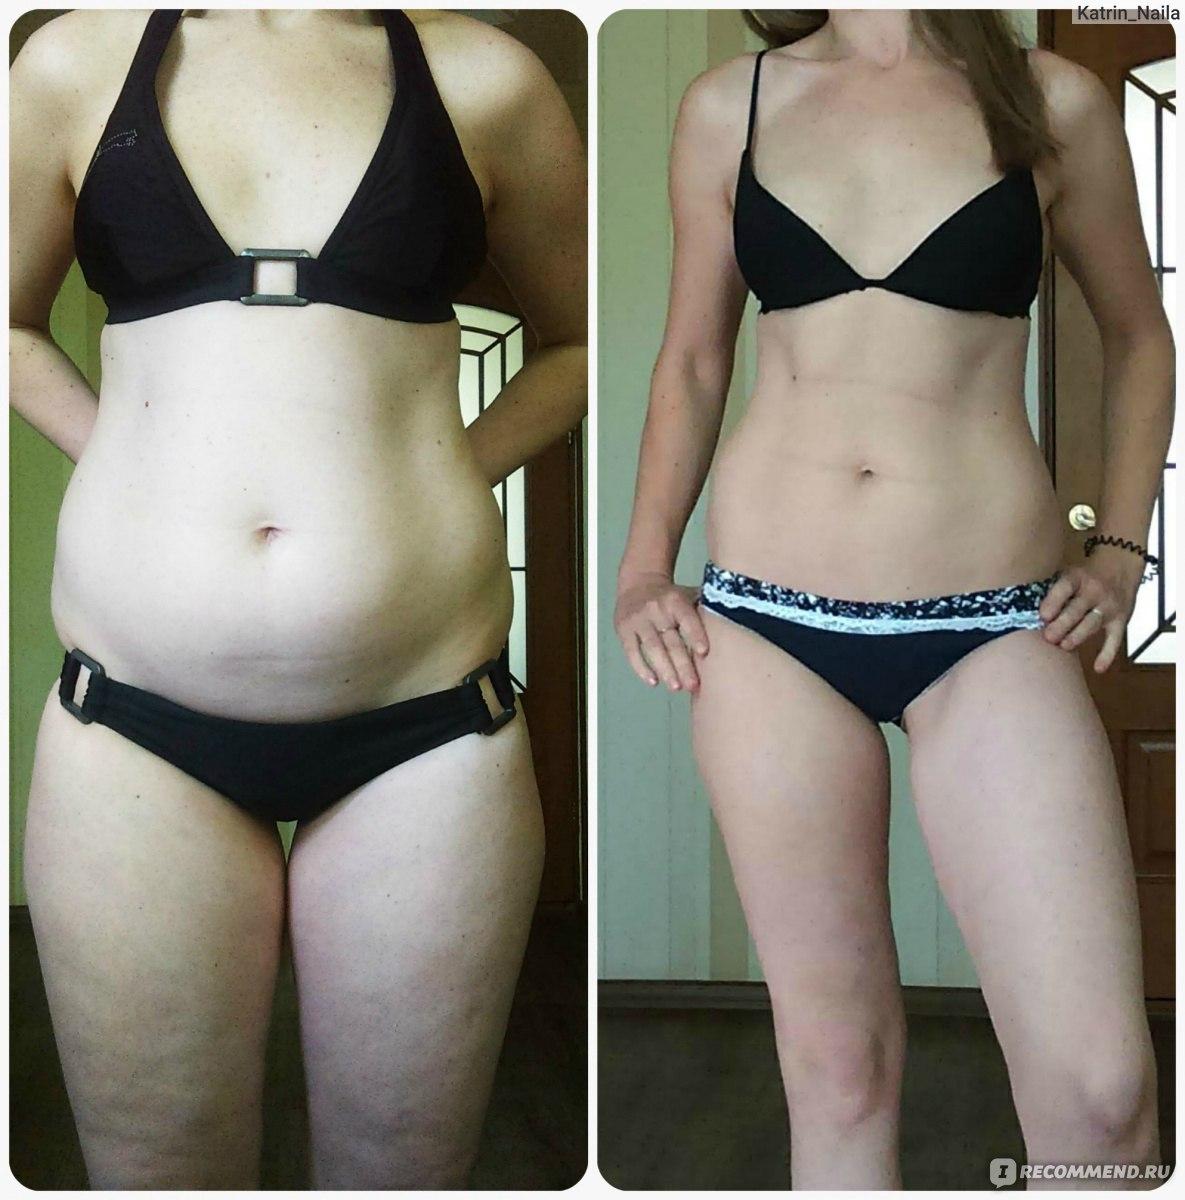 Гречневая диета на месяц результаты